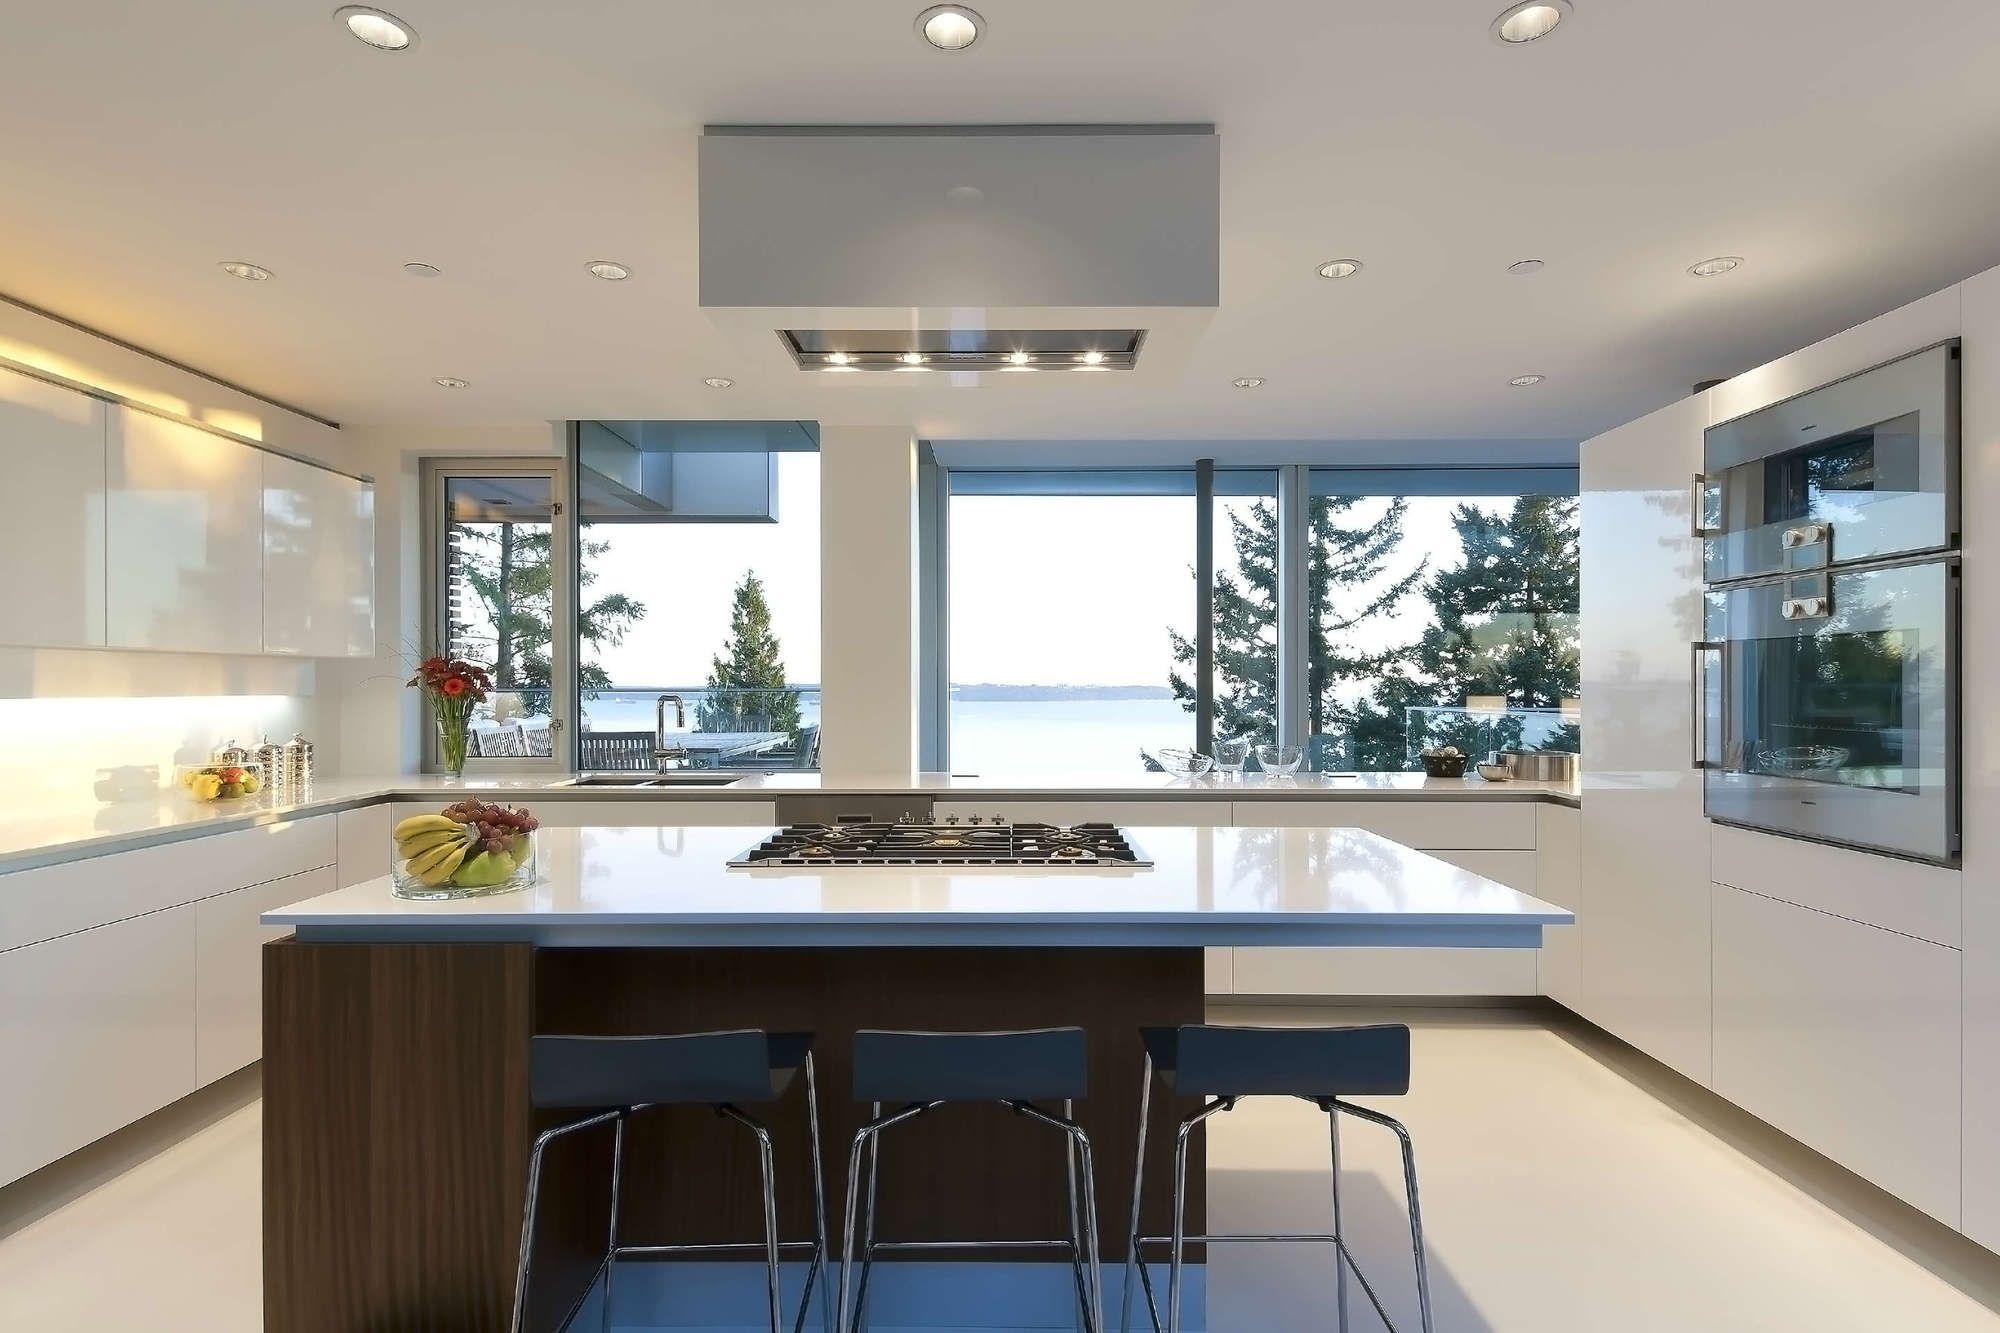 Modern kitchen window design  modern kitchen island stove  sodakaustica  pinterest